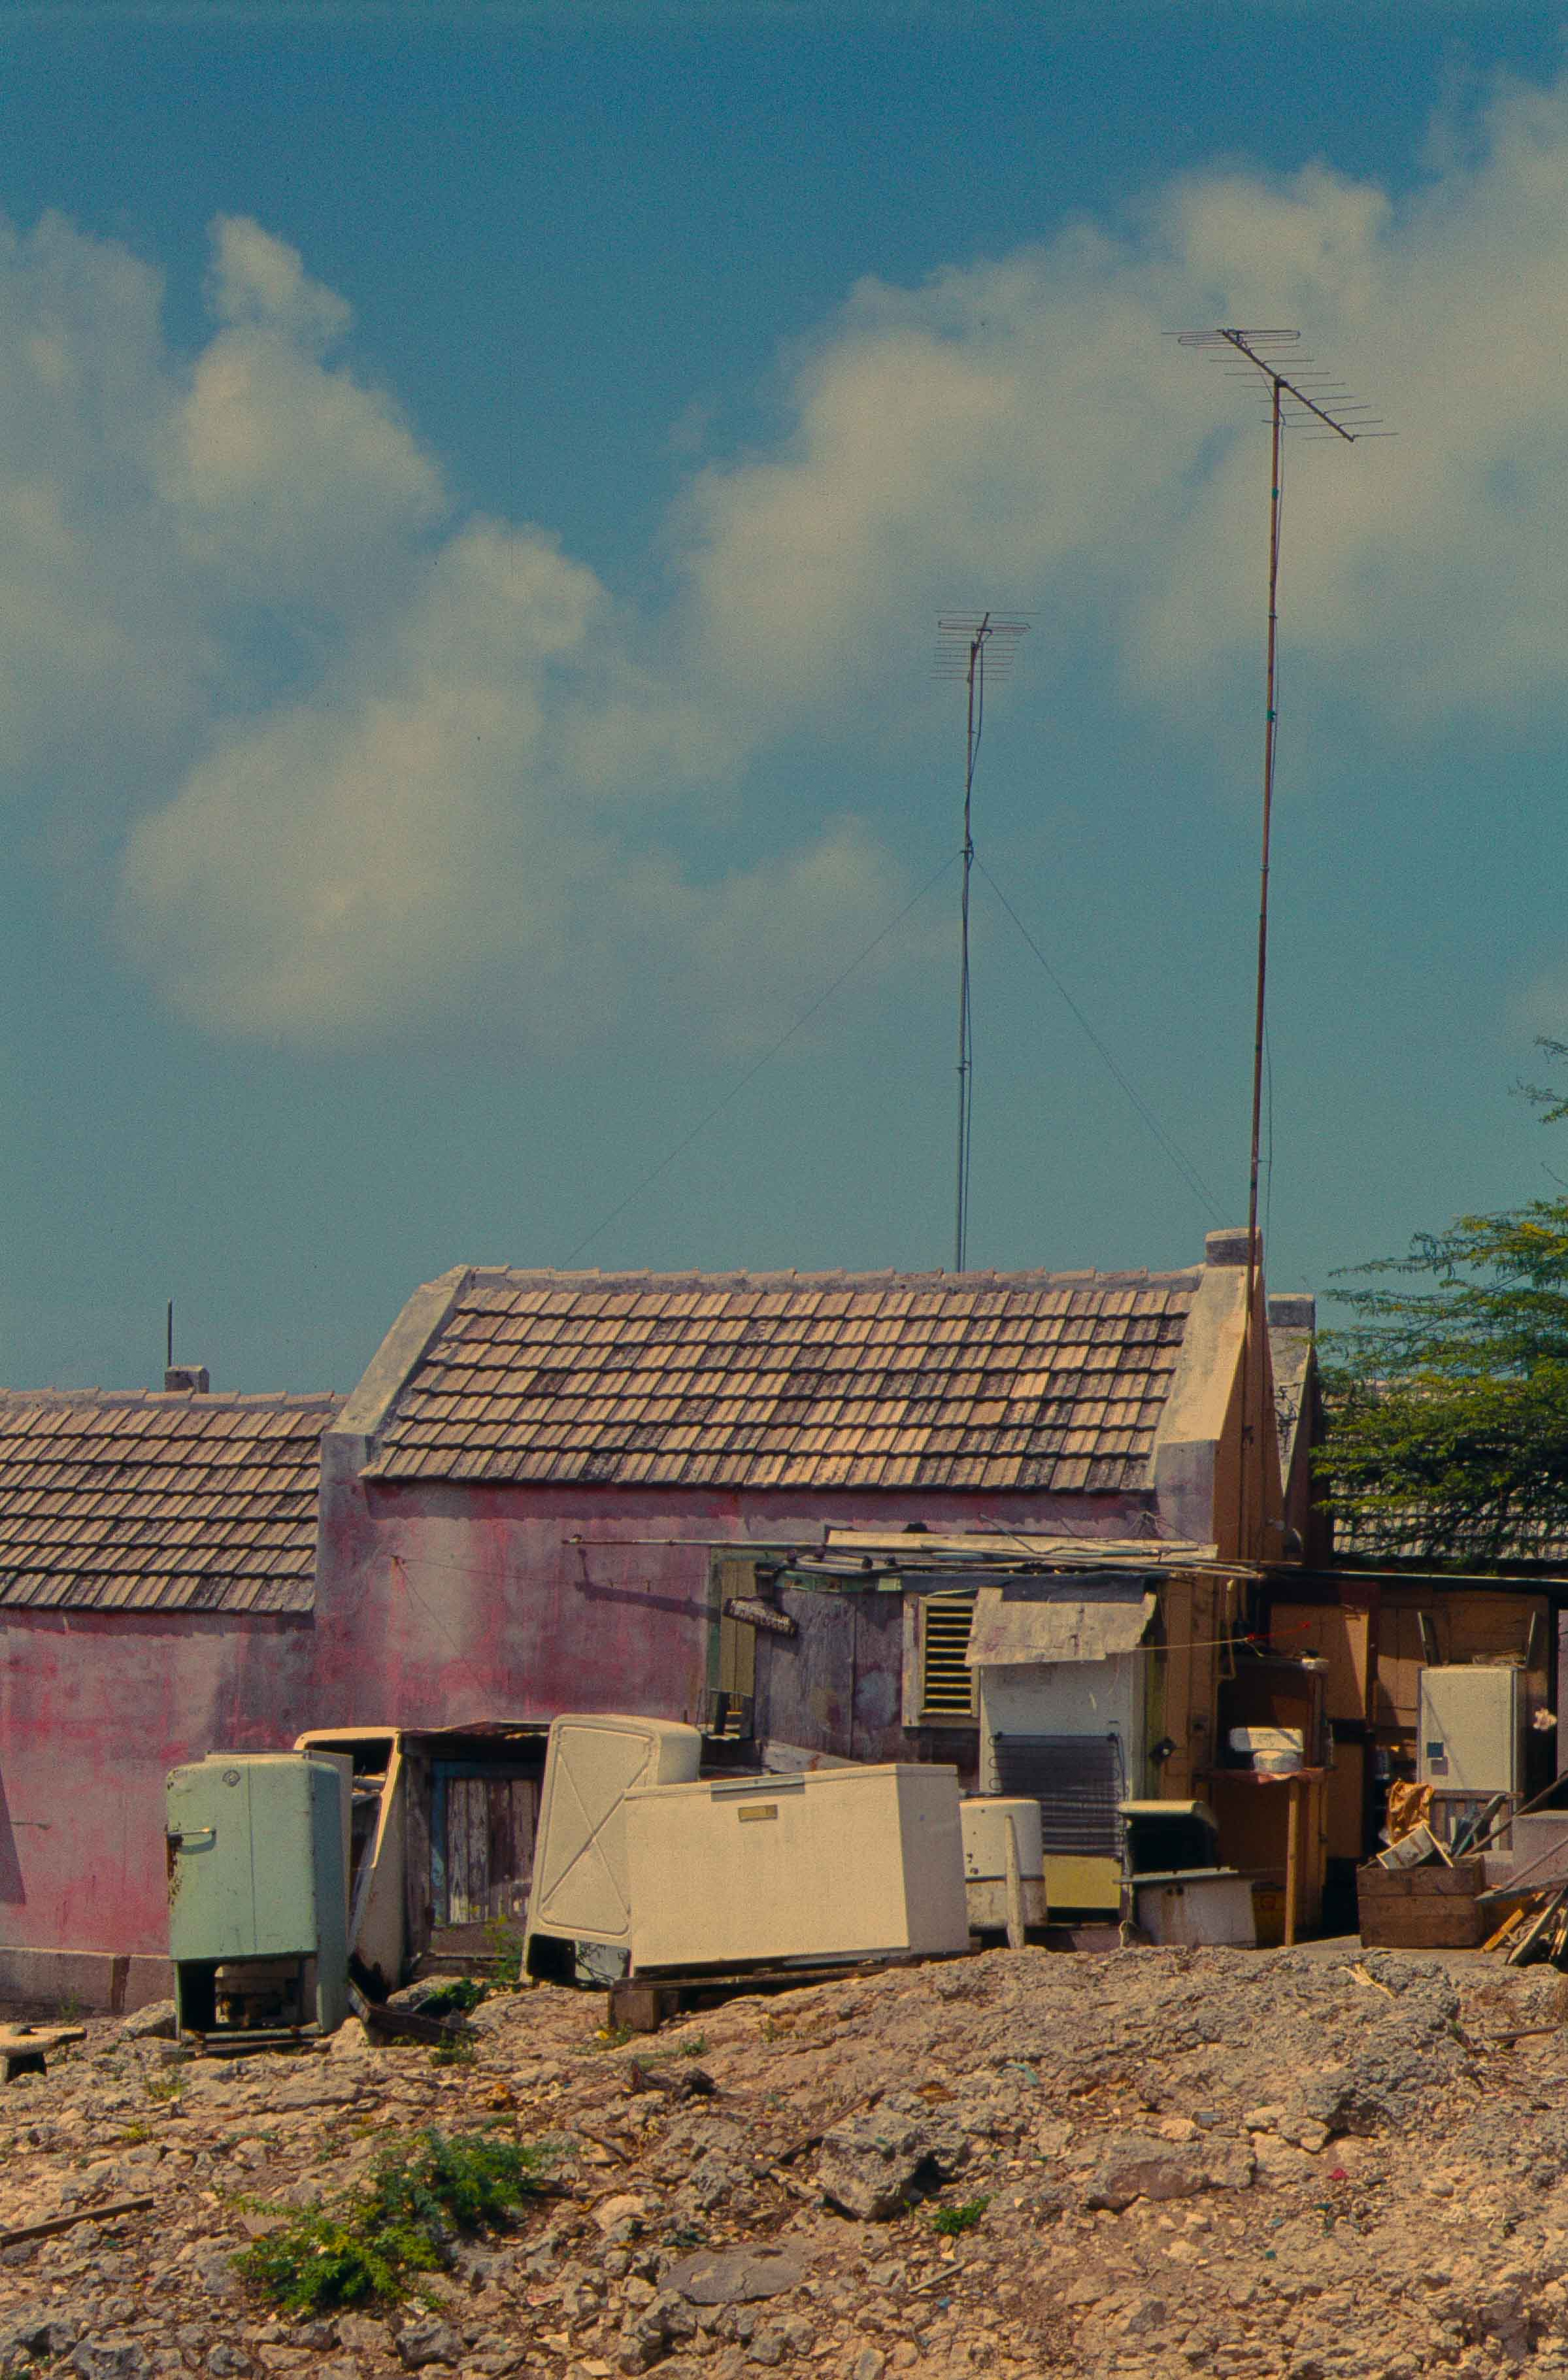 645. Suriname